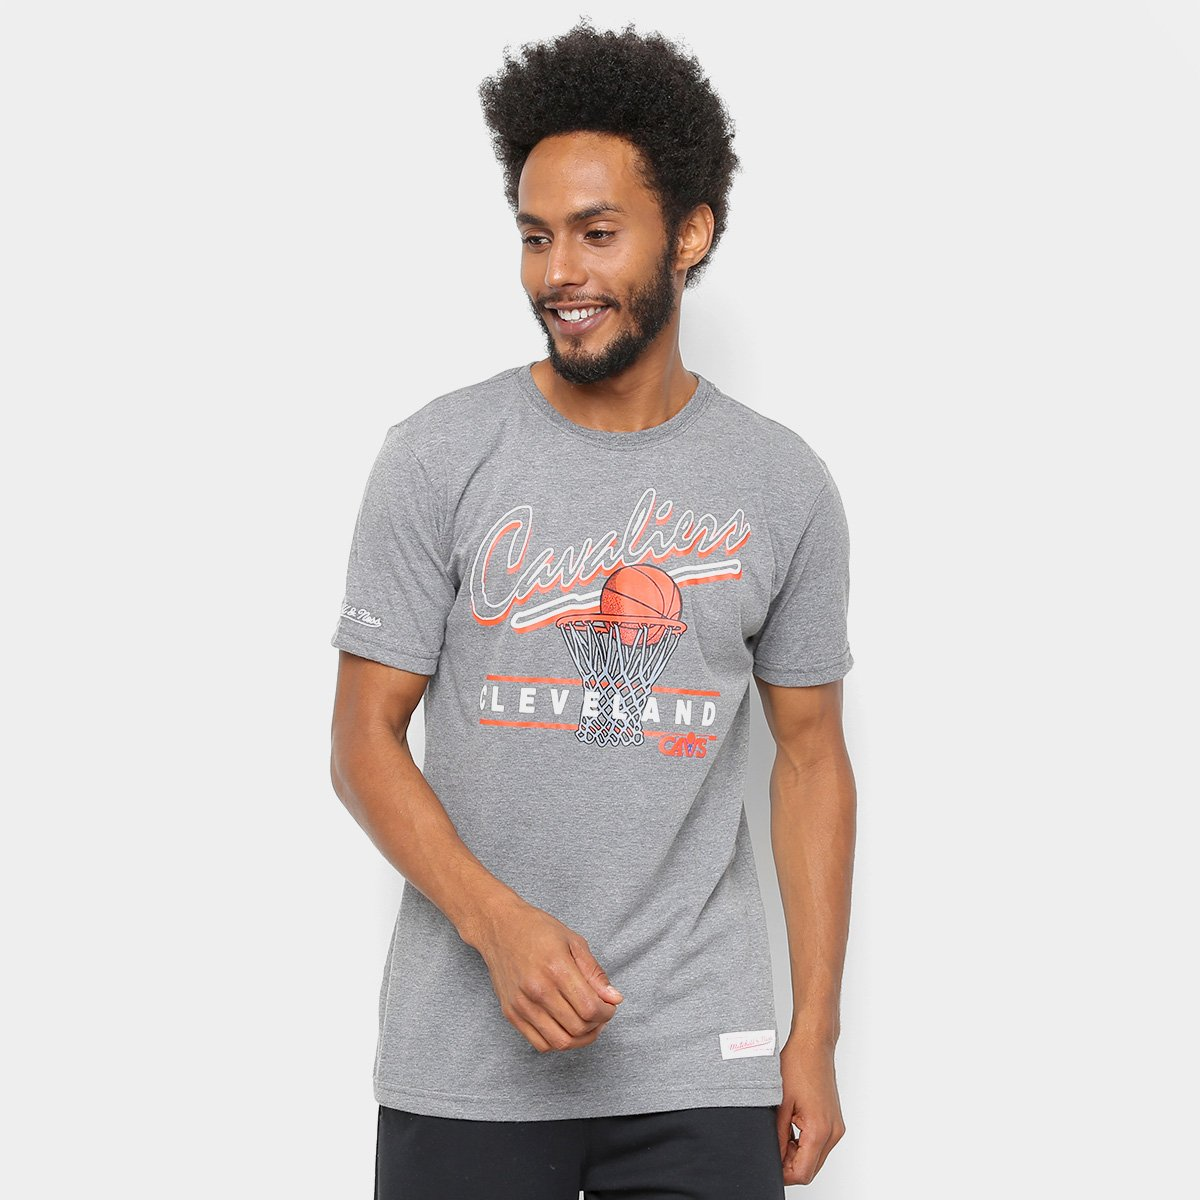 09e7adecb0500 Camiseta NBA Cleveland Cavaliers Mitchell   Ness Drive To The Basket II  Masculina - Cinza - Compre Agora